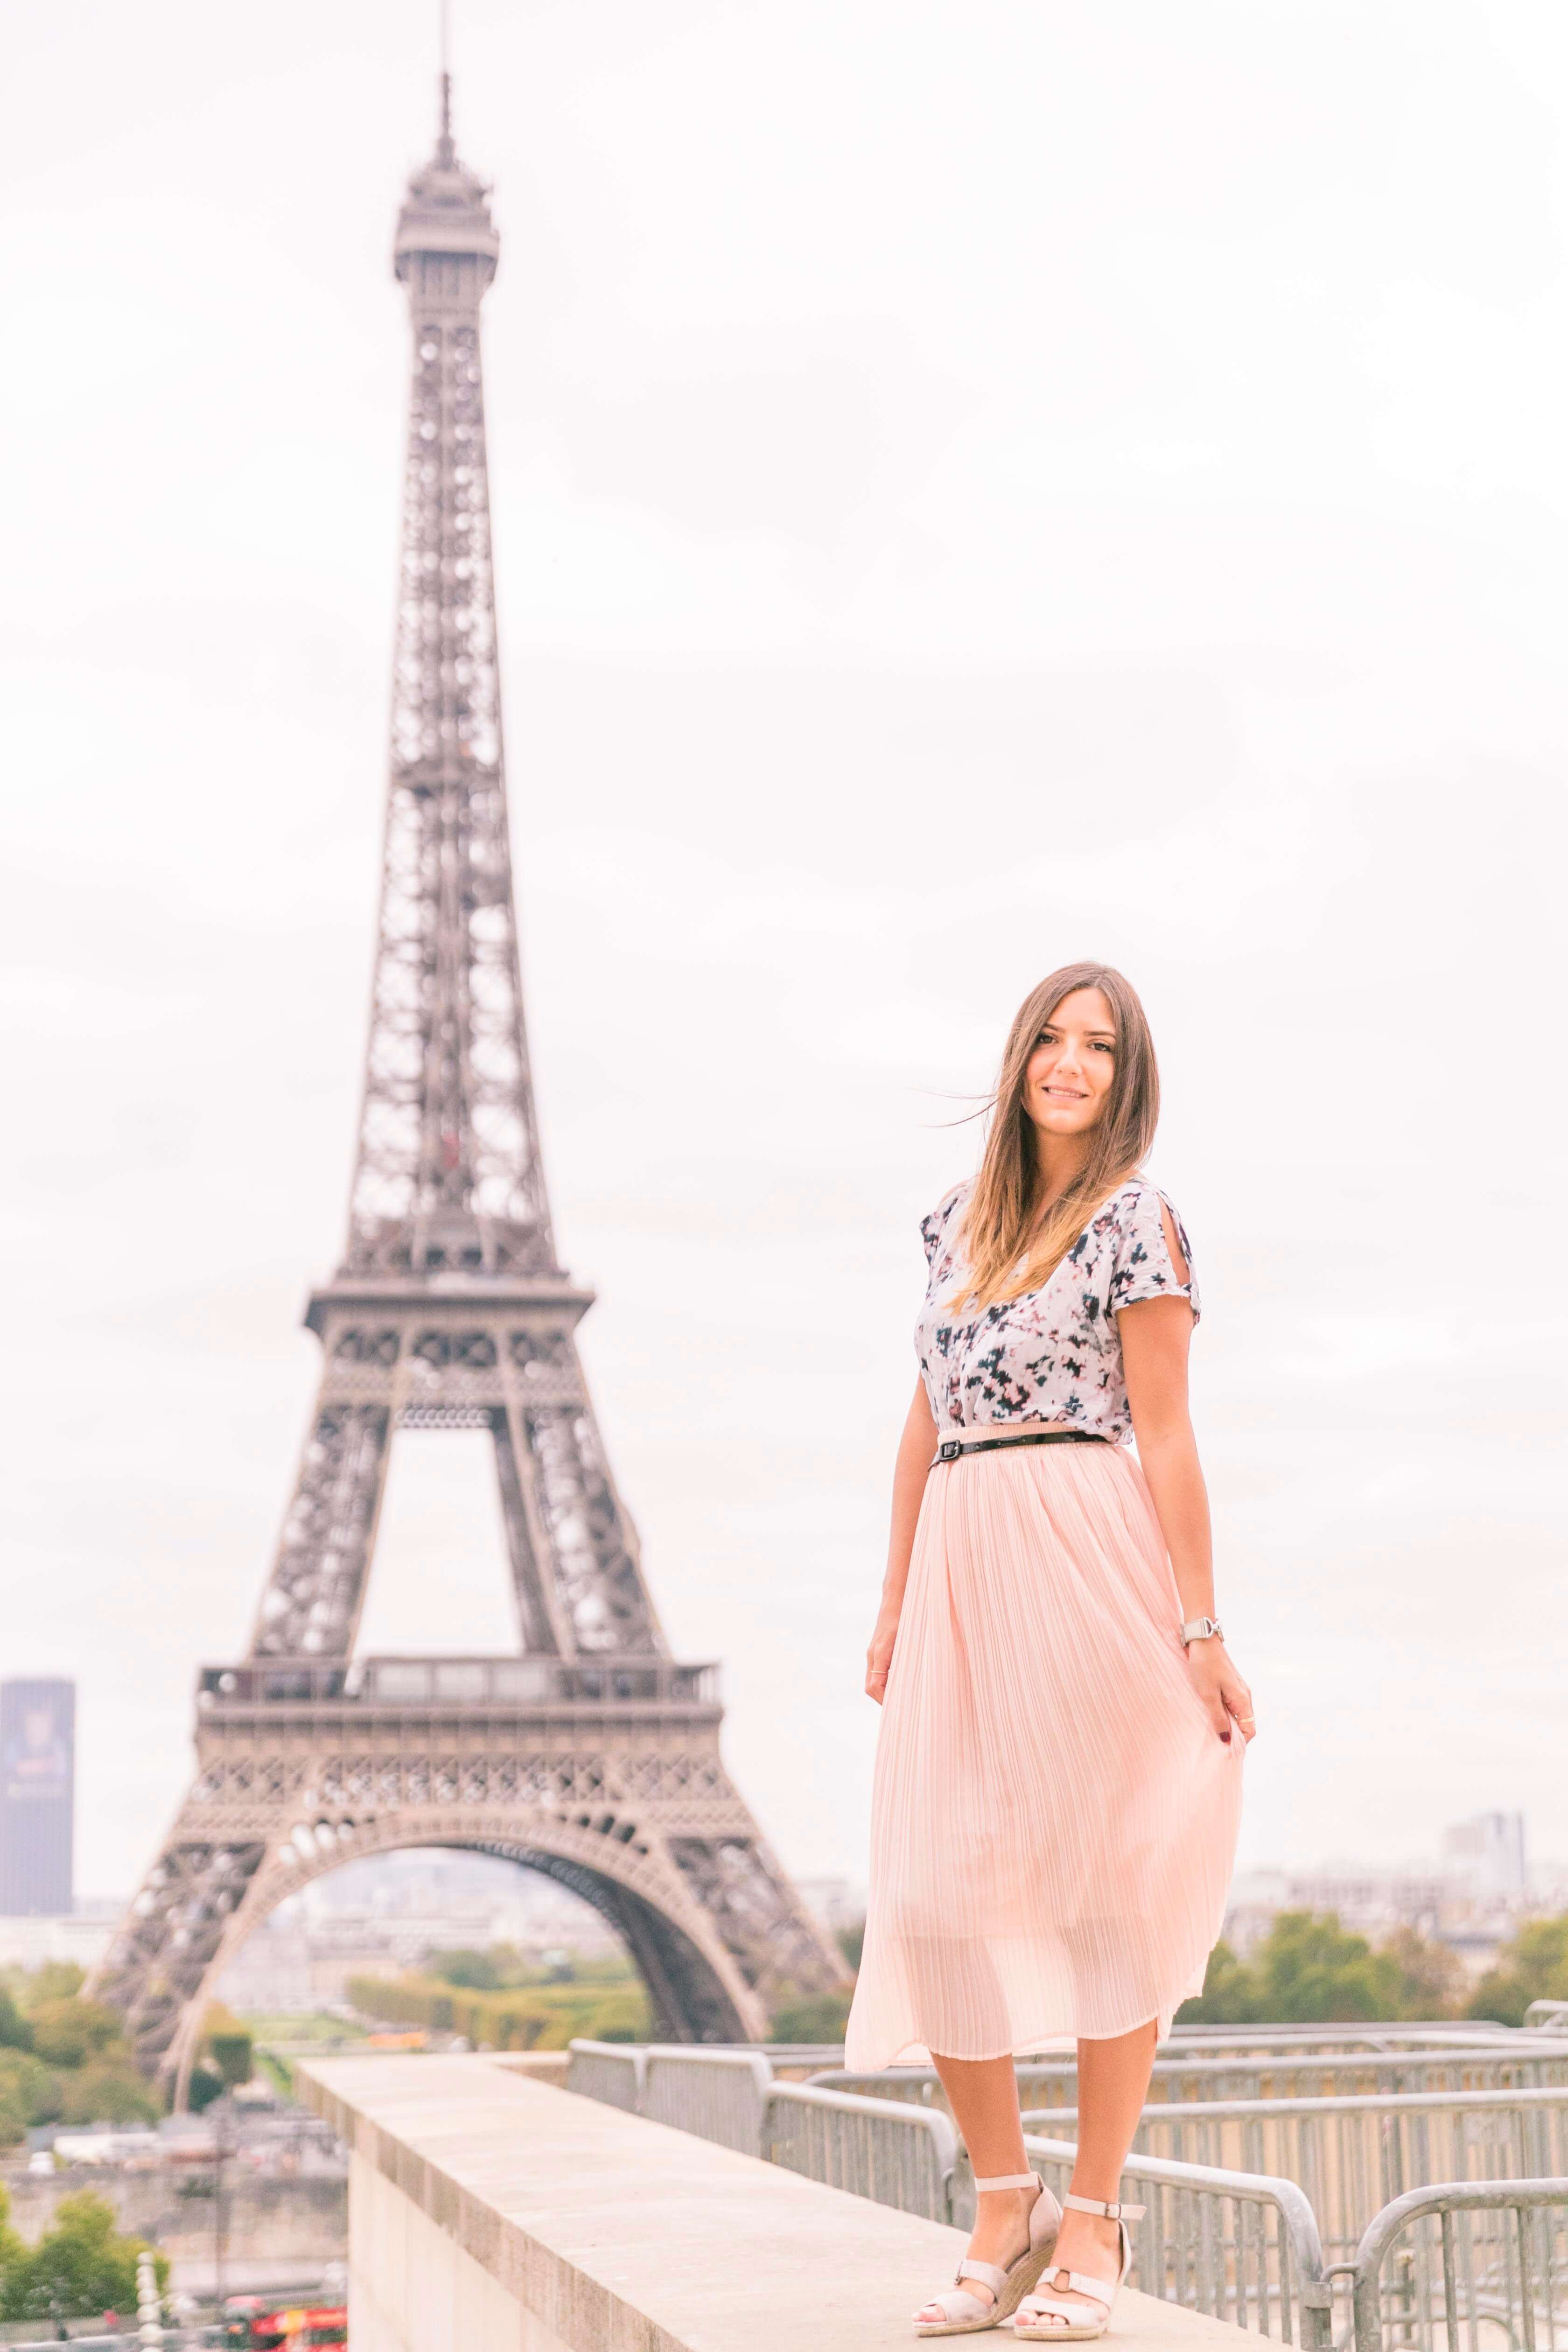 comment porter la jupe plissee blog mode tendance